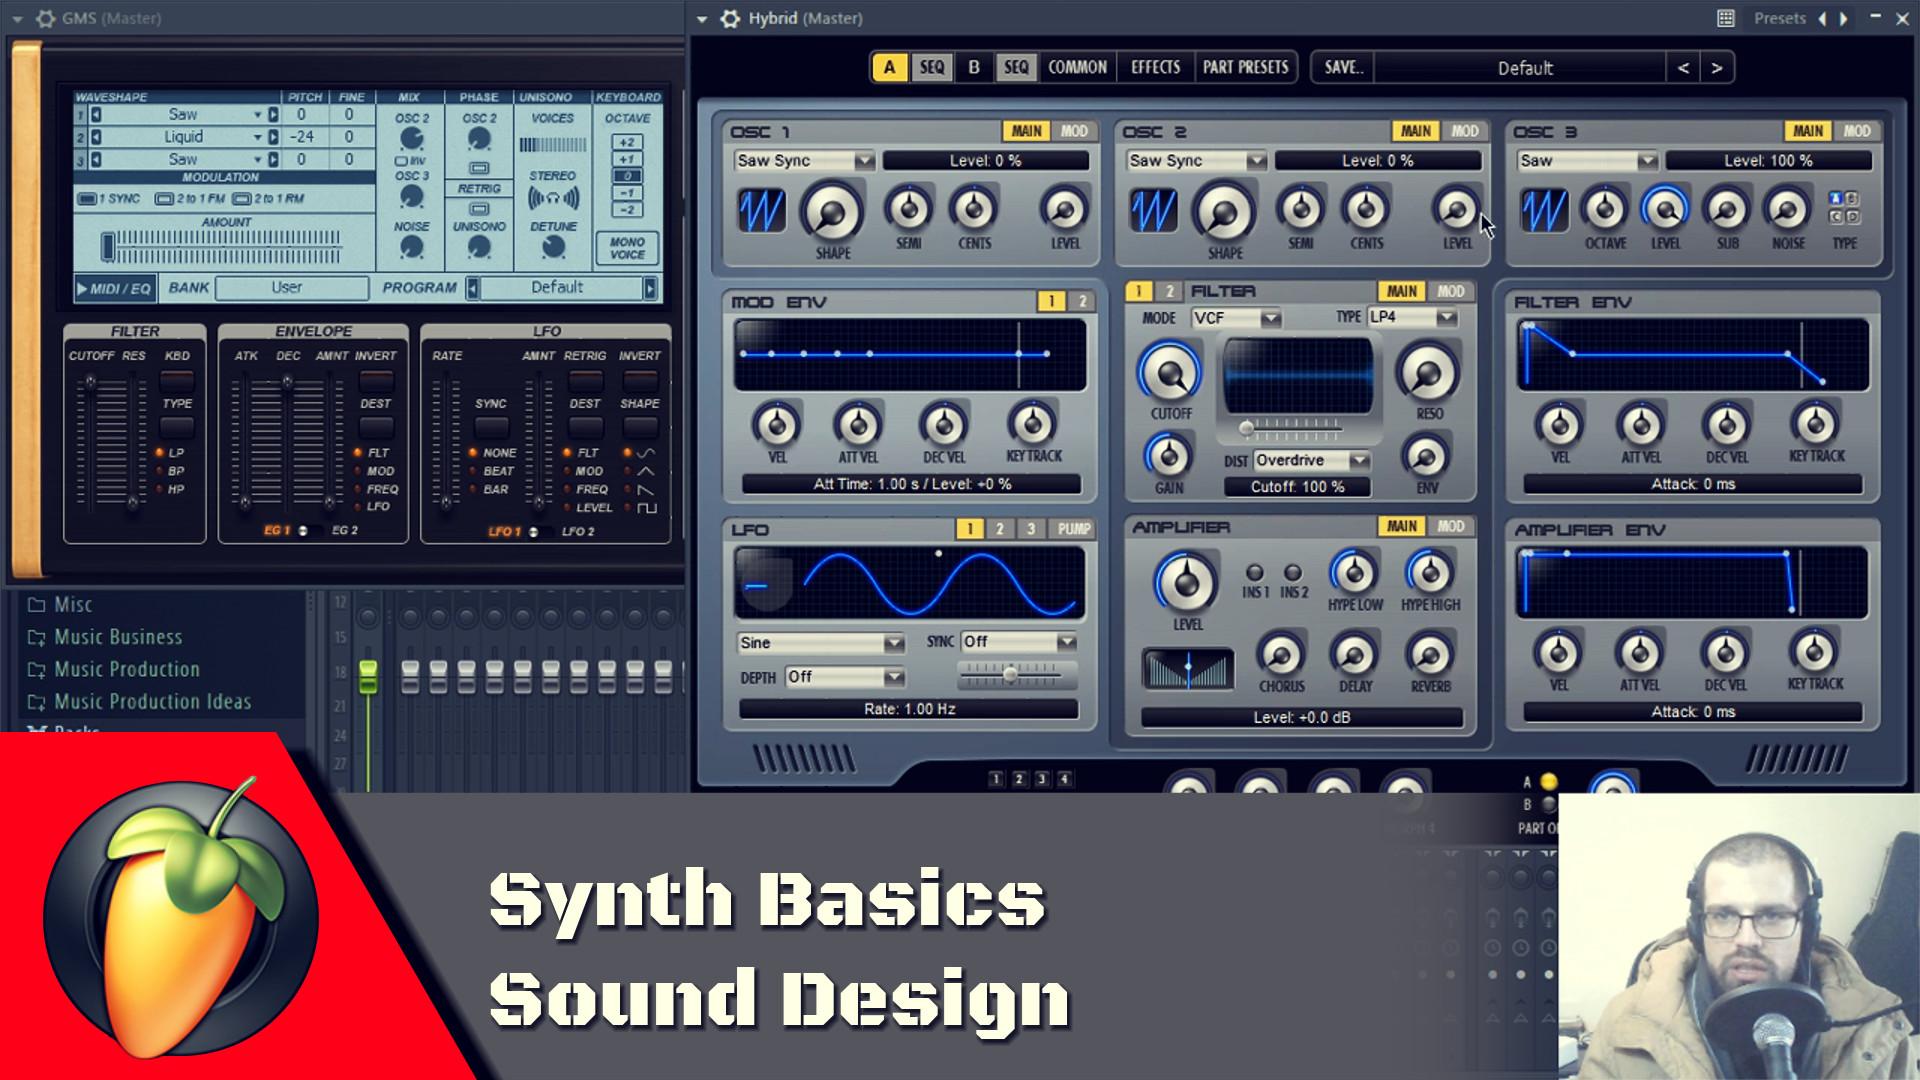 Synth Basics